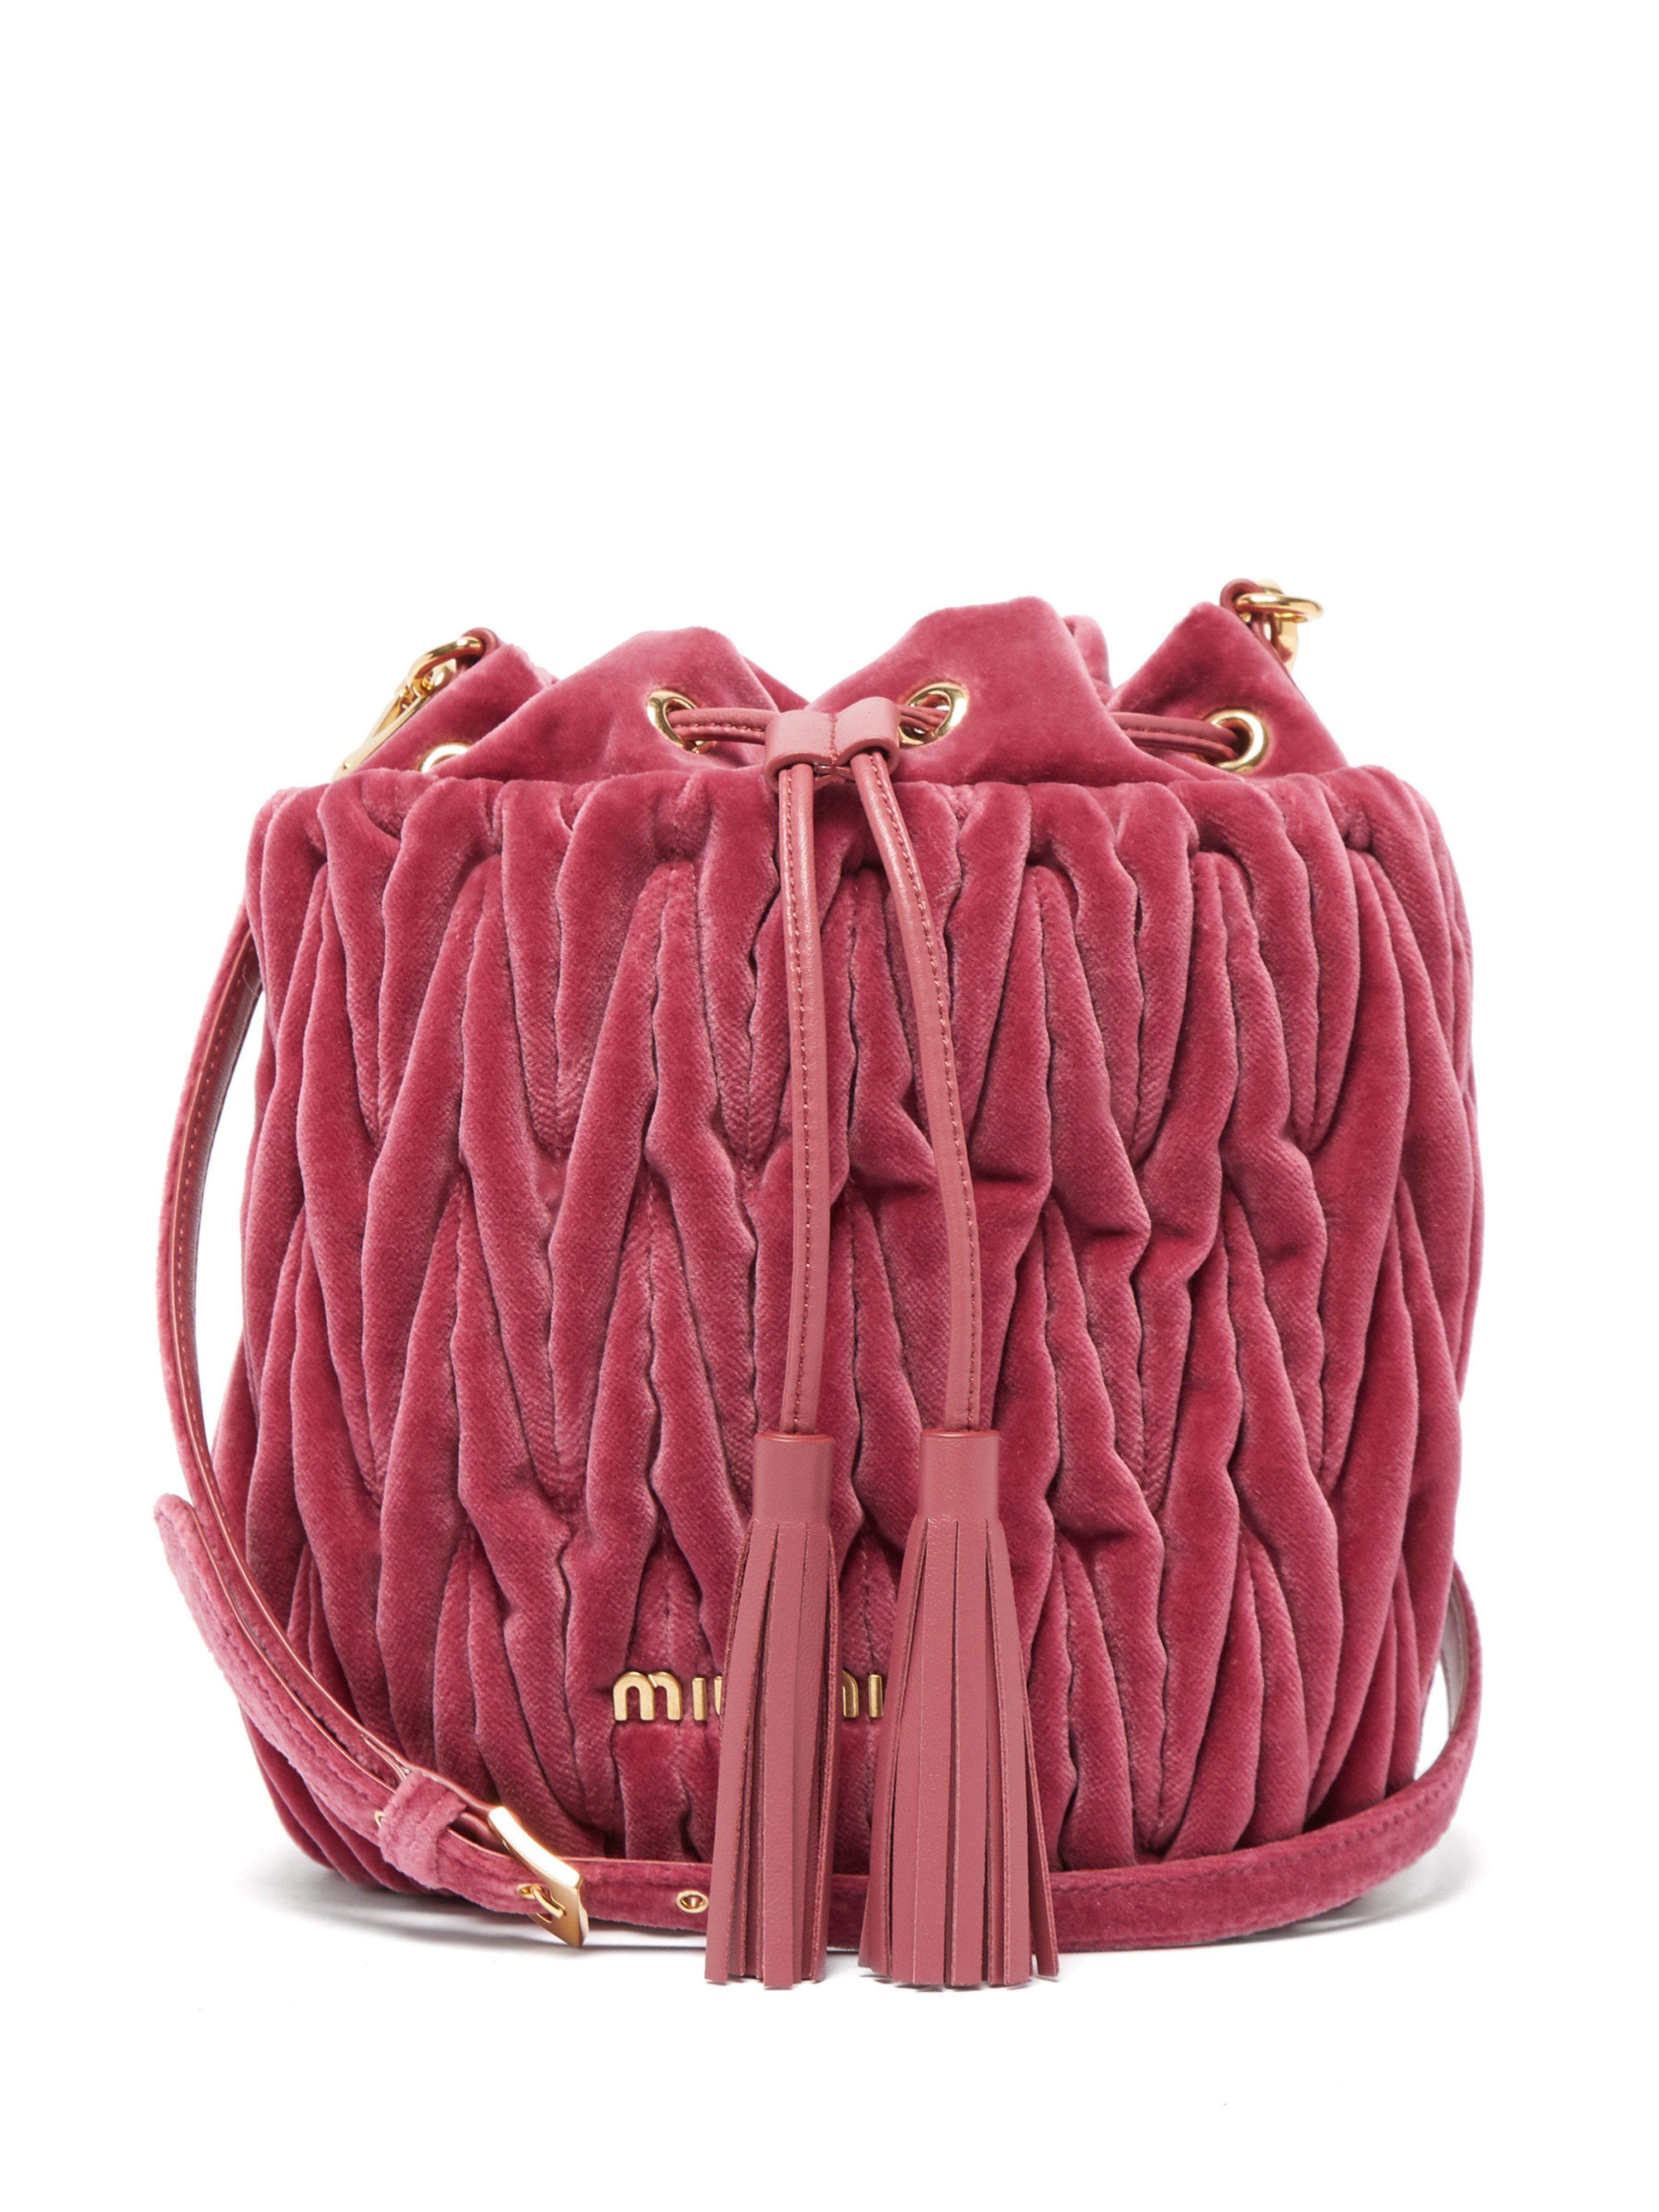 6f288fcc9fe4 Miu Miu Matelassé Quilted Velvet Bucket Bag in Pink - Lyst